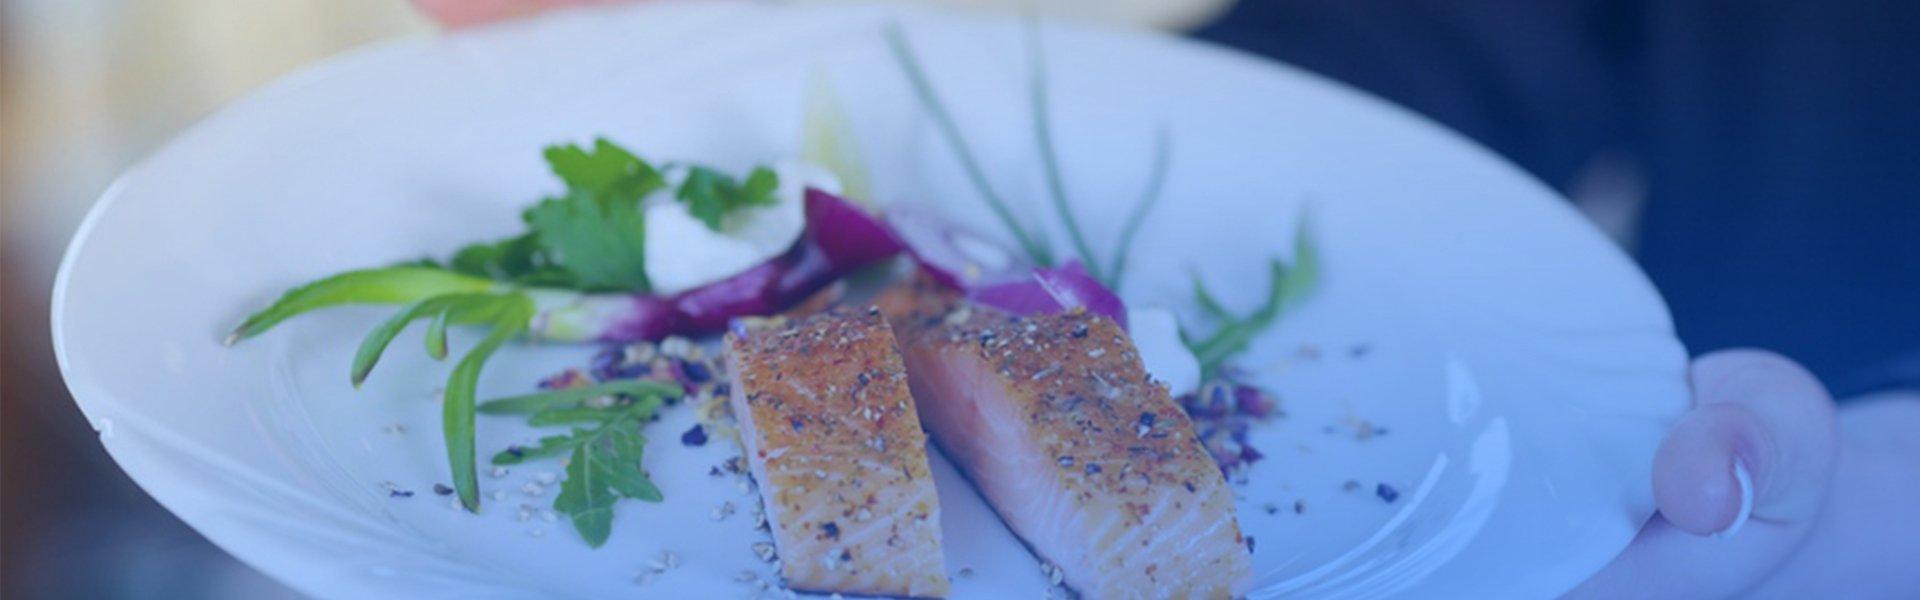 capa de blogpost gastronomia funcional